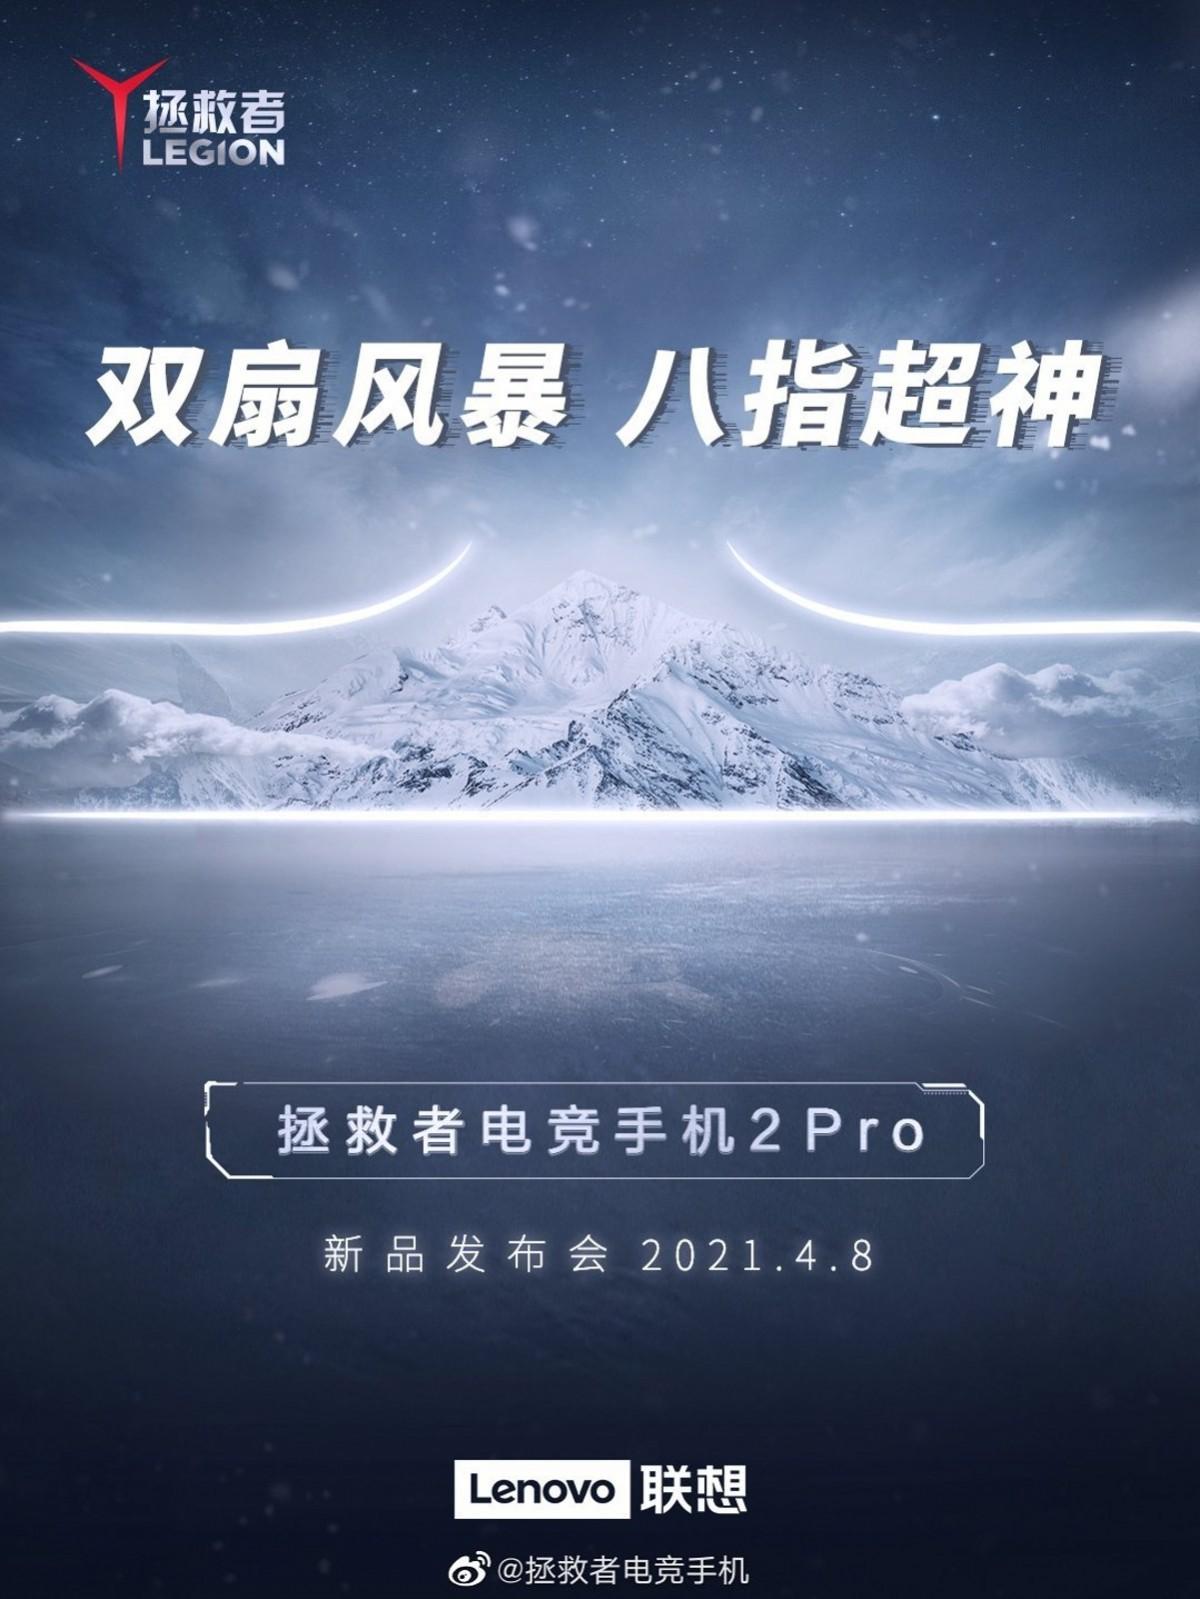 Lenovo Legion 2 Pro event